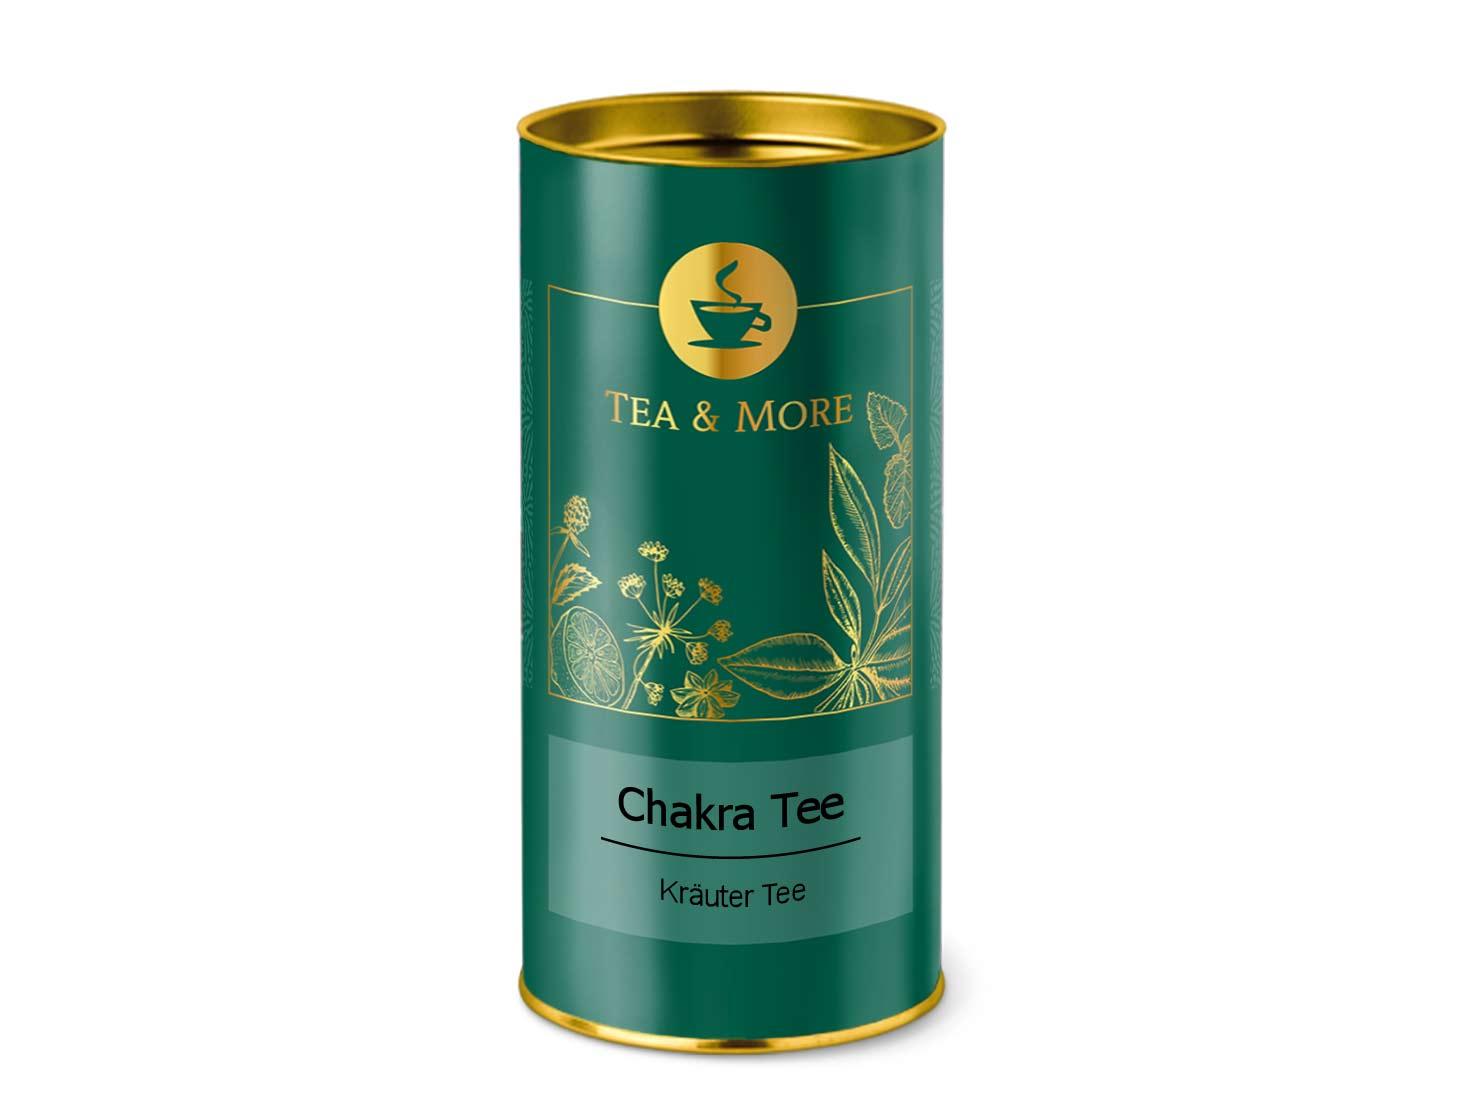 Chakra Tee